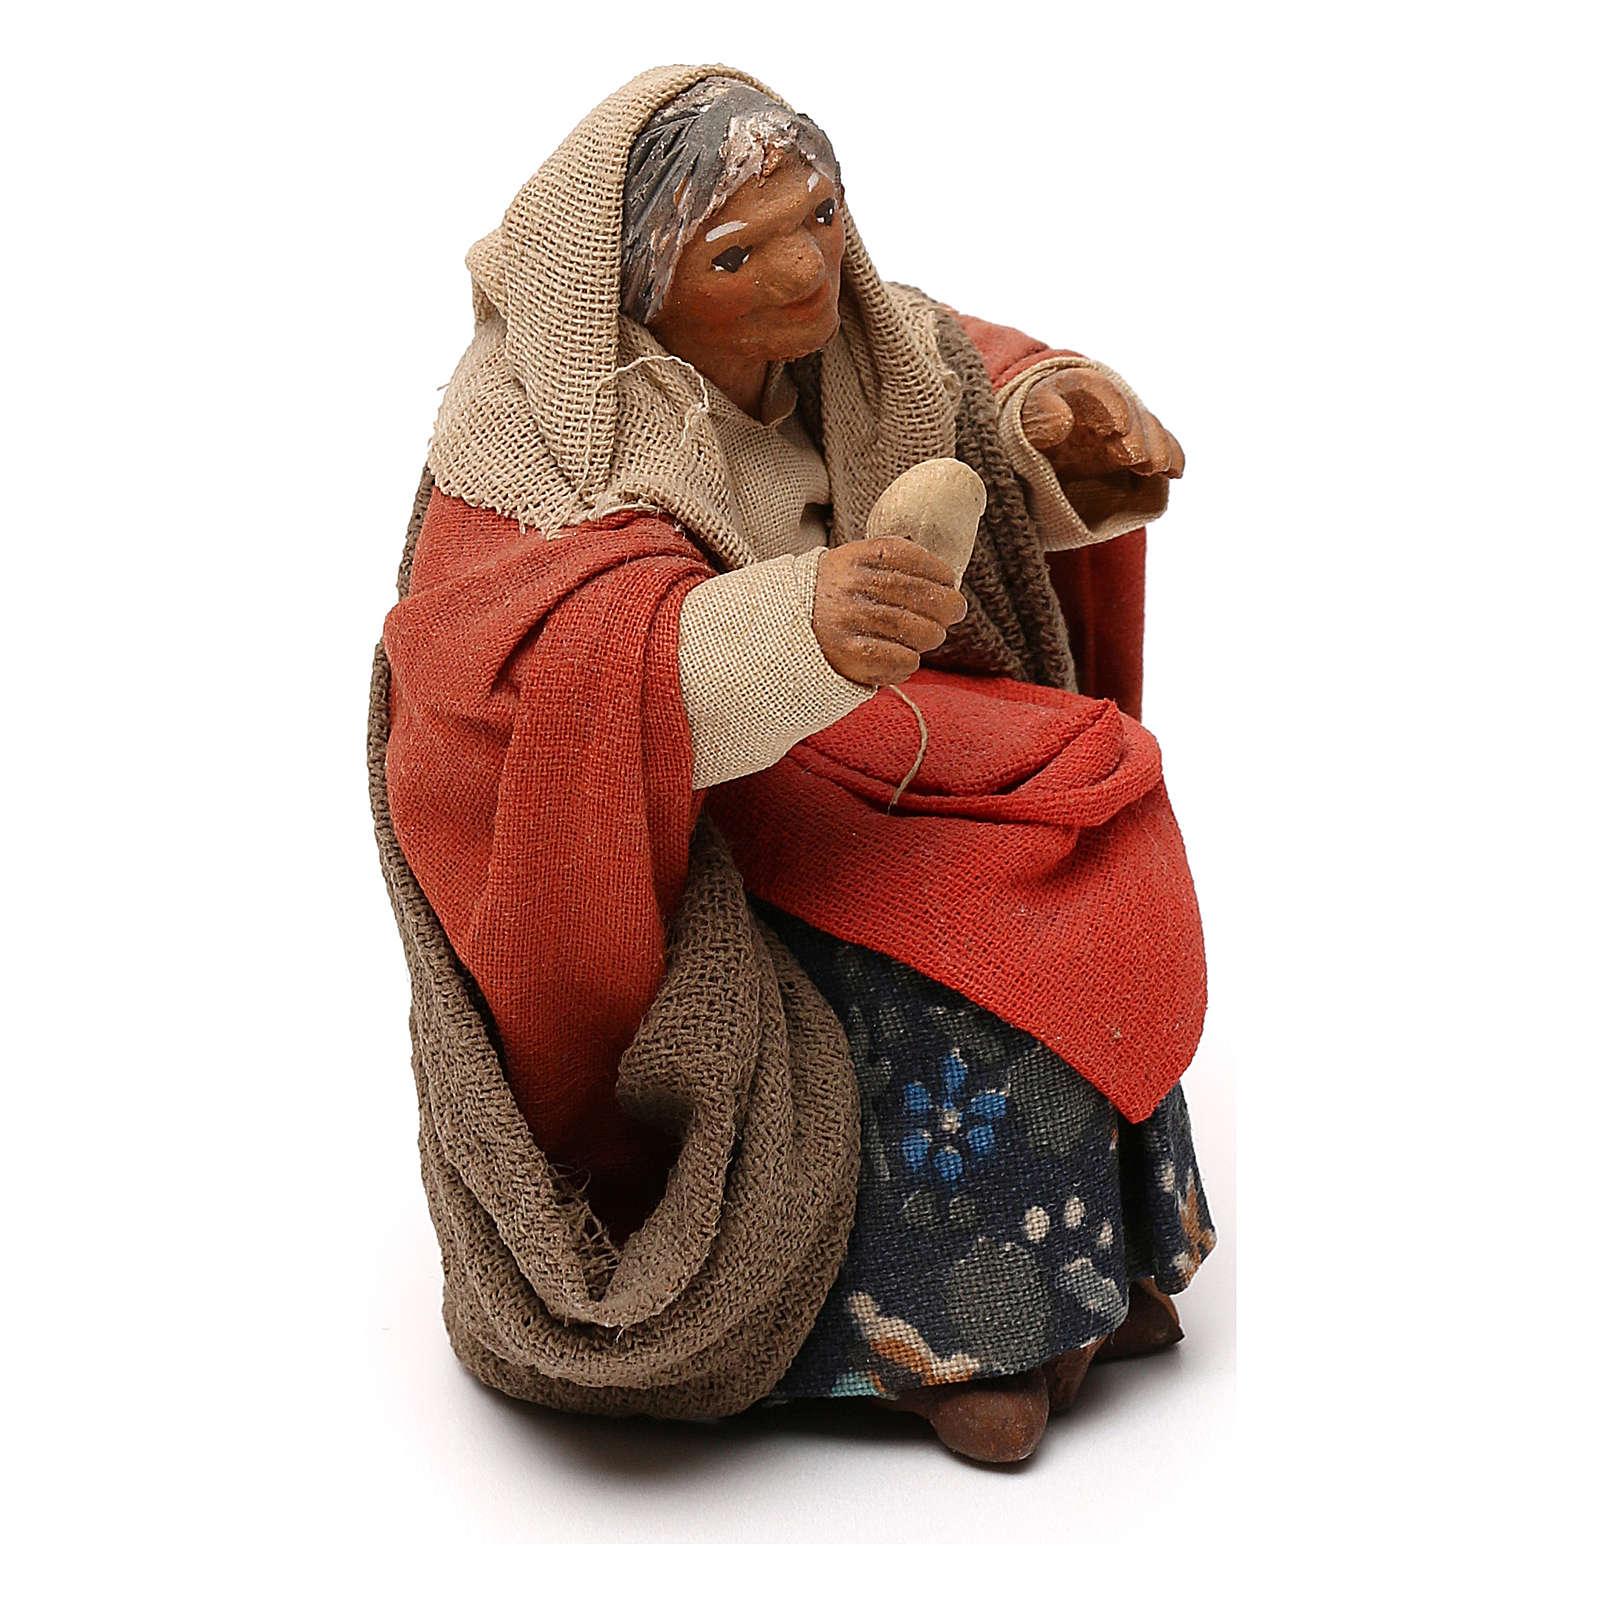 STOCK Donna seduta vestita con pane in terracotta cm 10 presepe napoletano 4